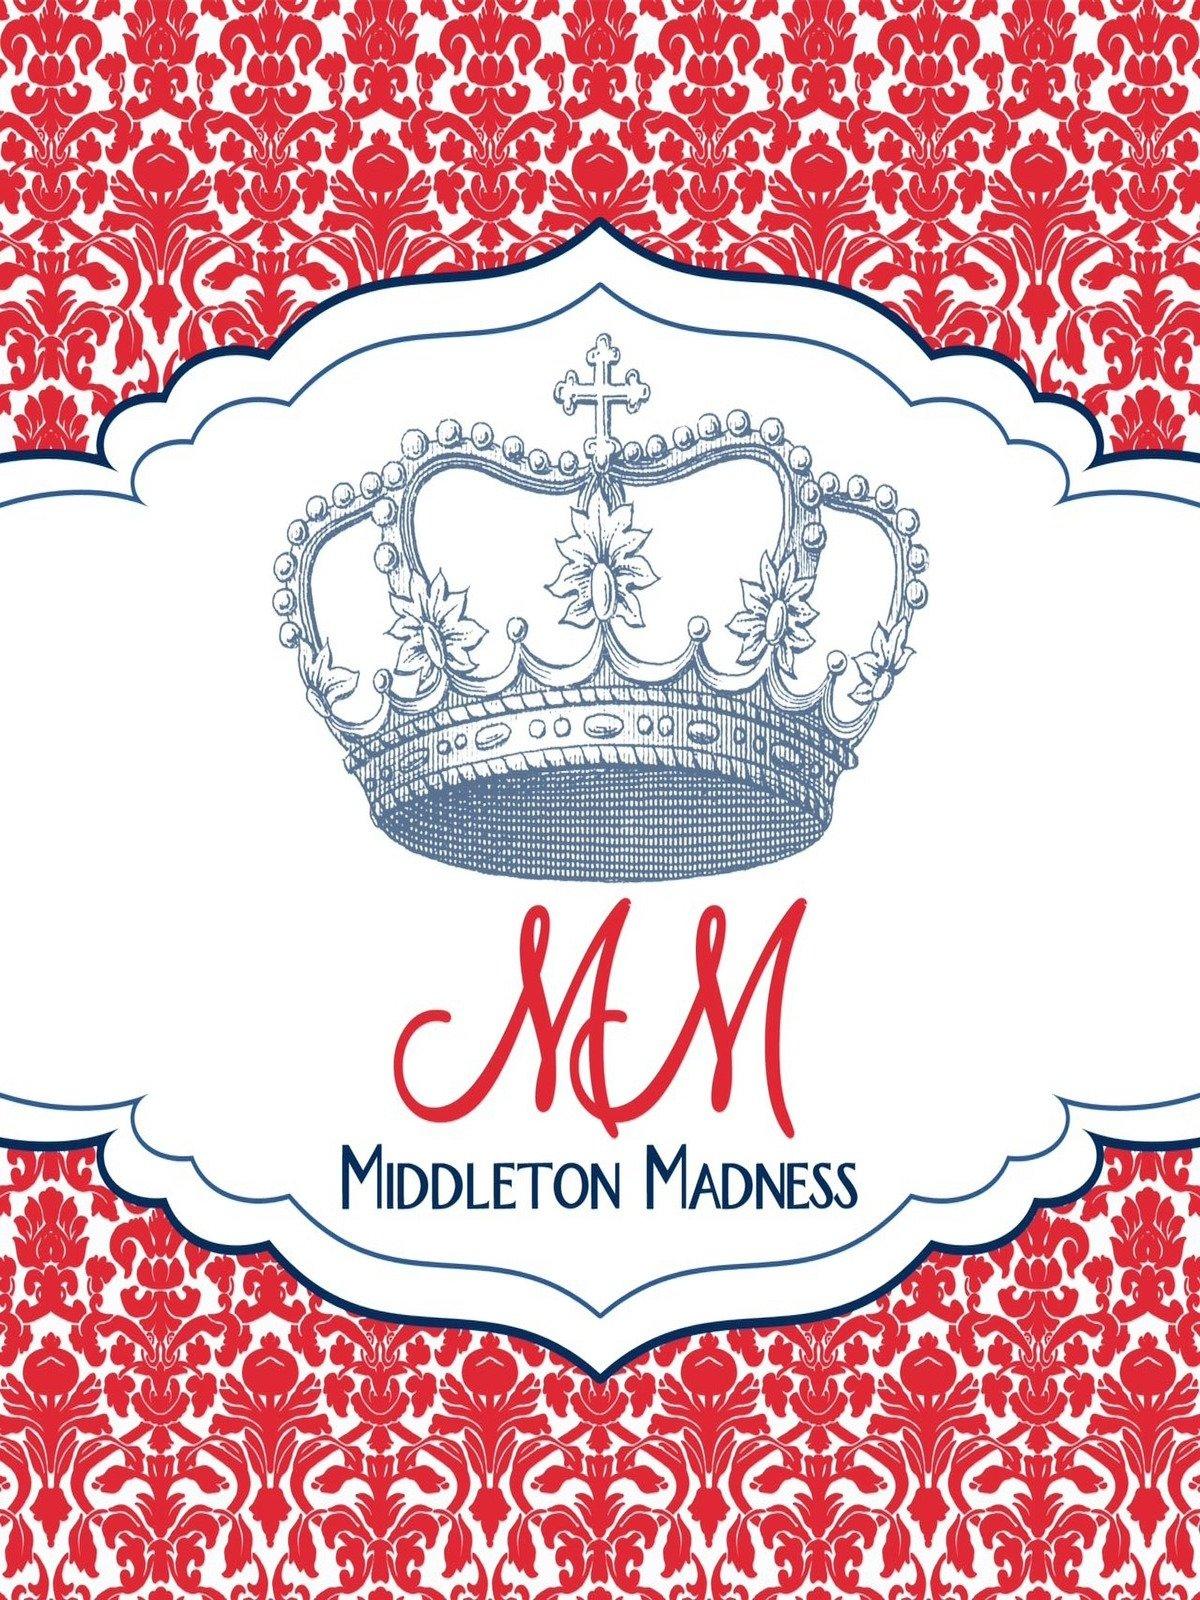 Middleton Madness